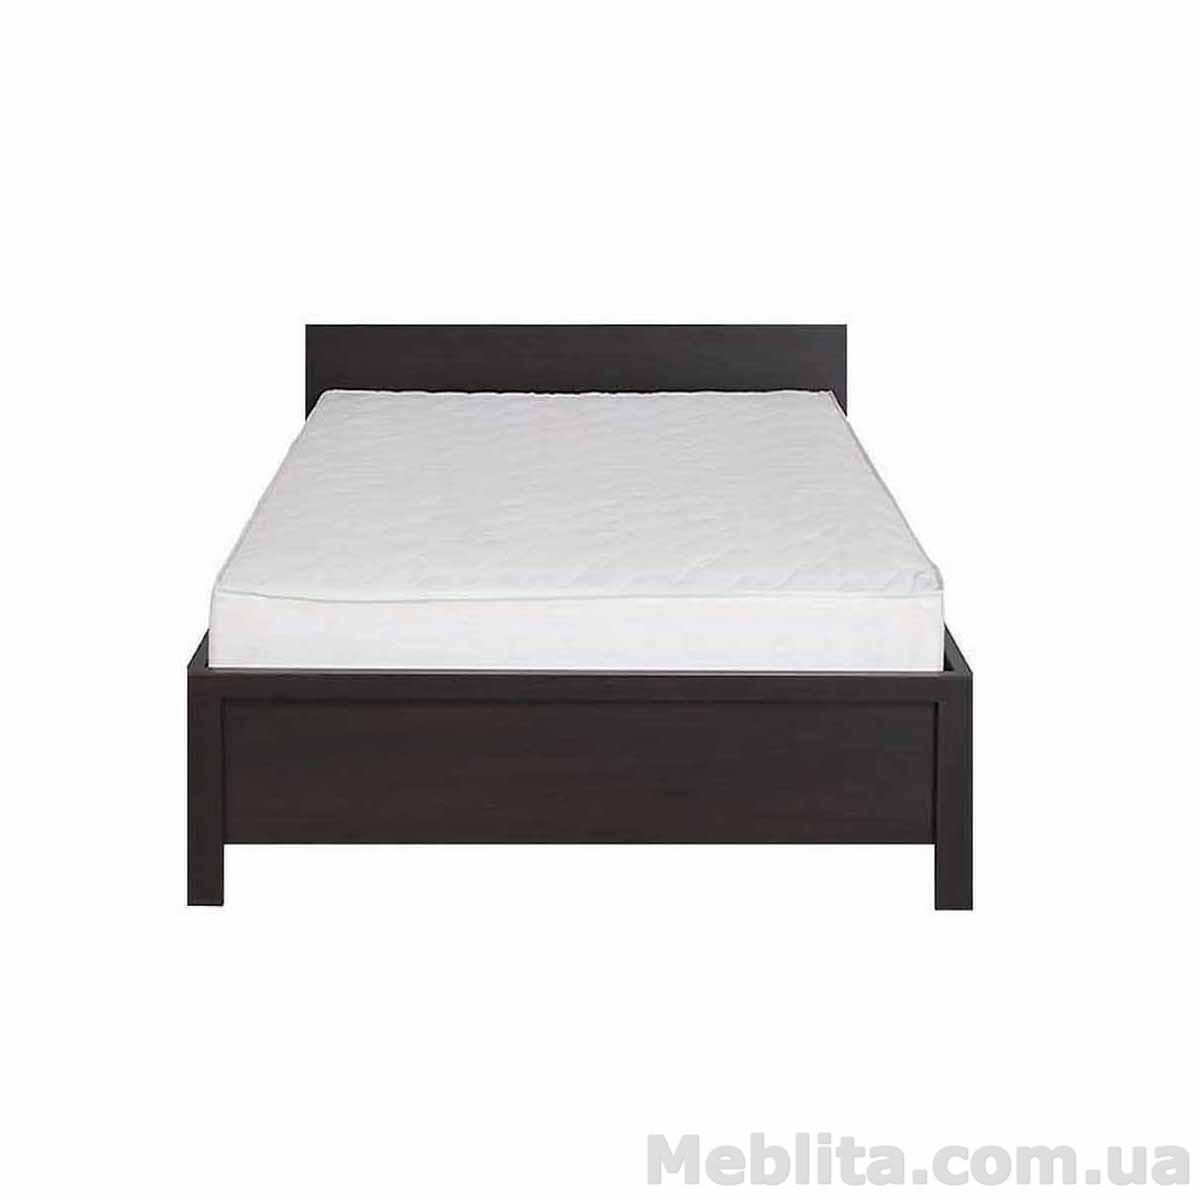 КАСПИАН(л) Кровать LOZ 90 (каркас)